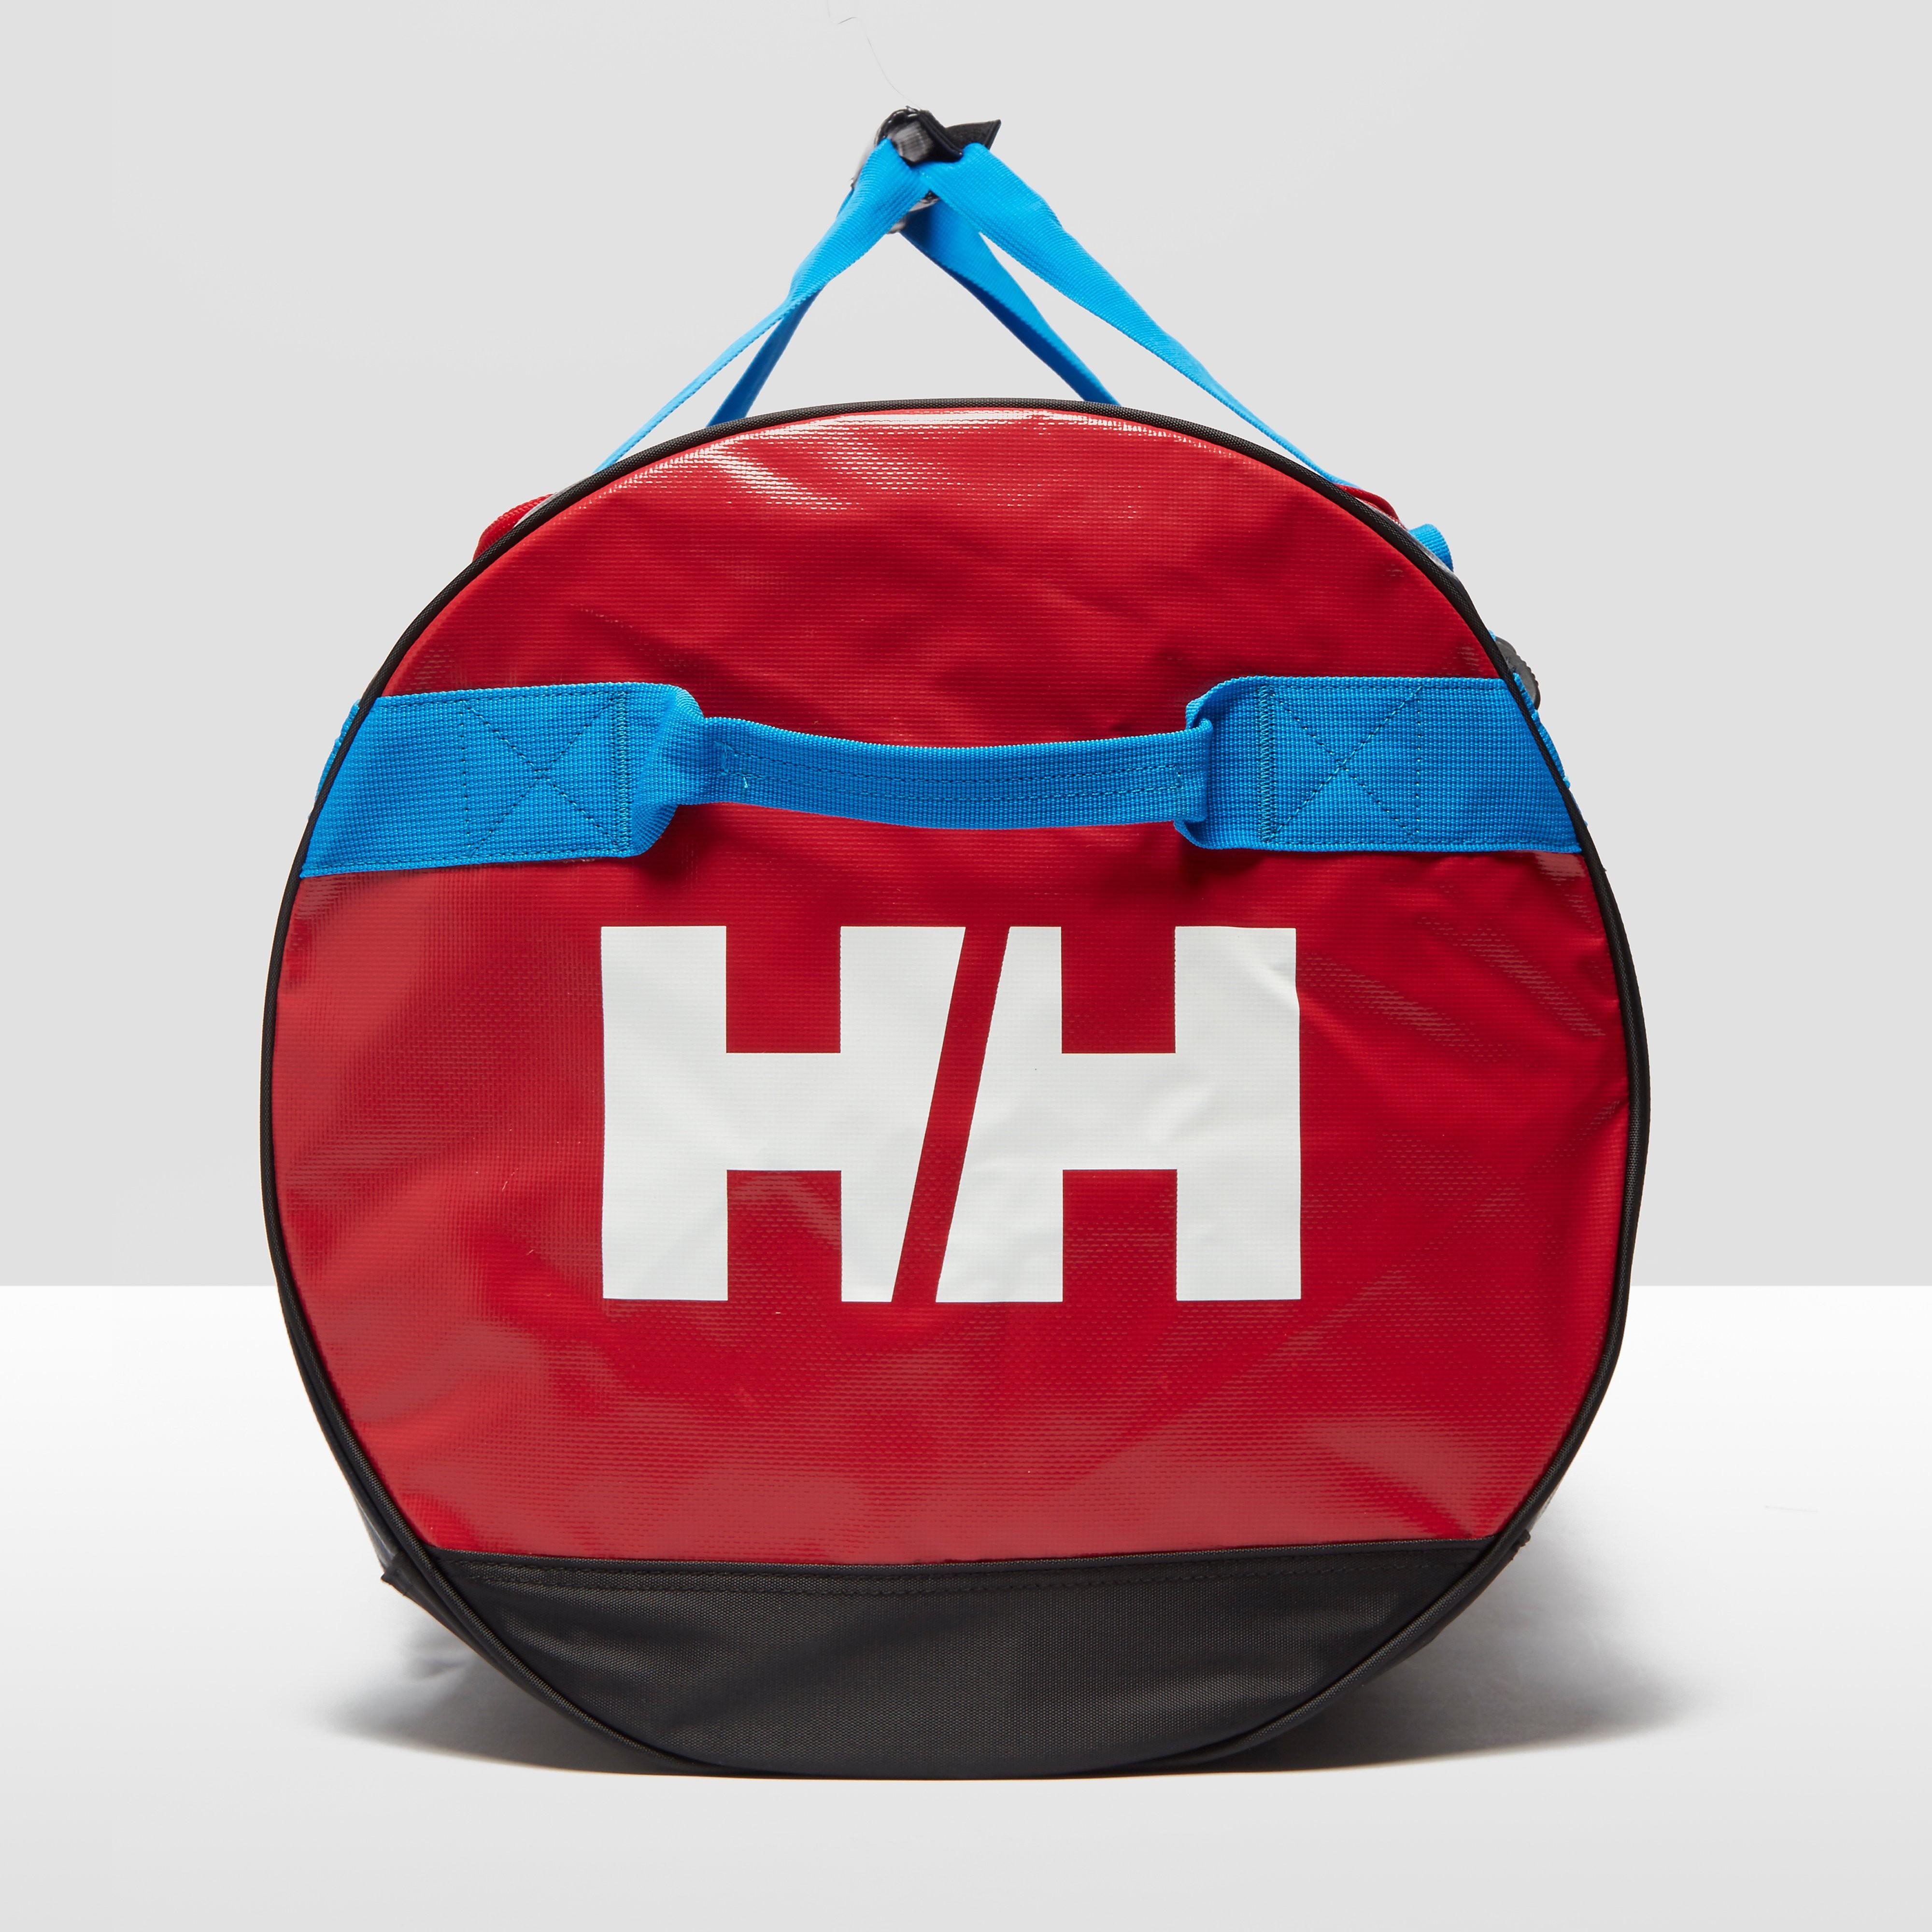 Helly hansen Classic Duffle Bag 90L